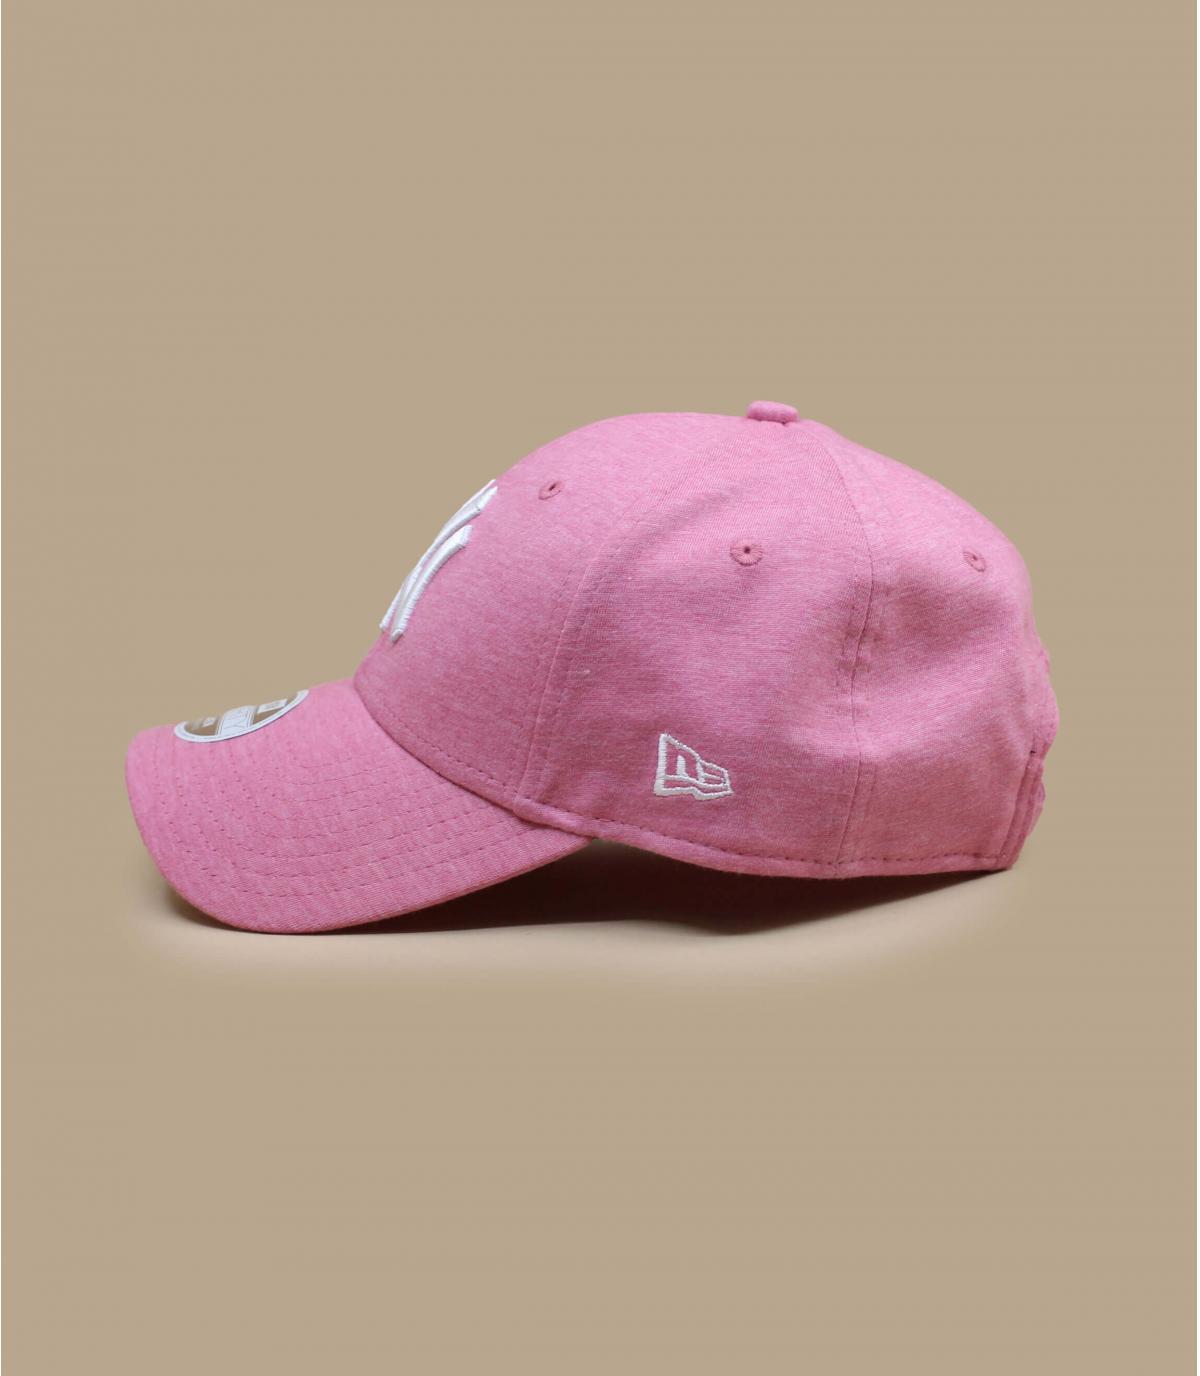 Details Wmn Jersey Ess 940 NY pink - afbeeling 3